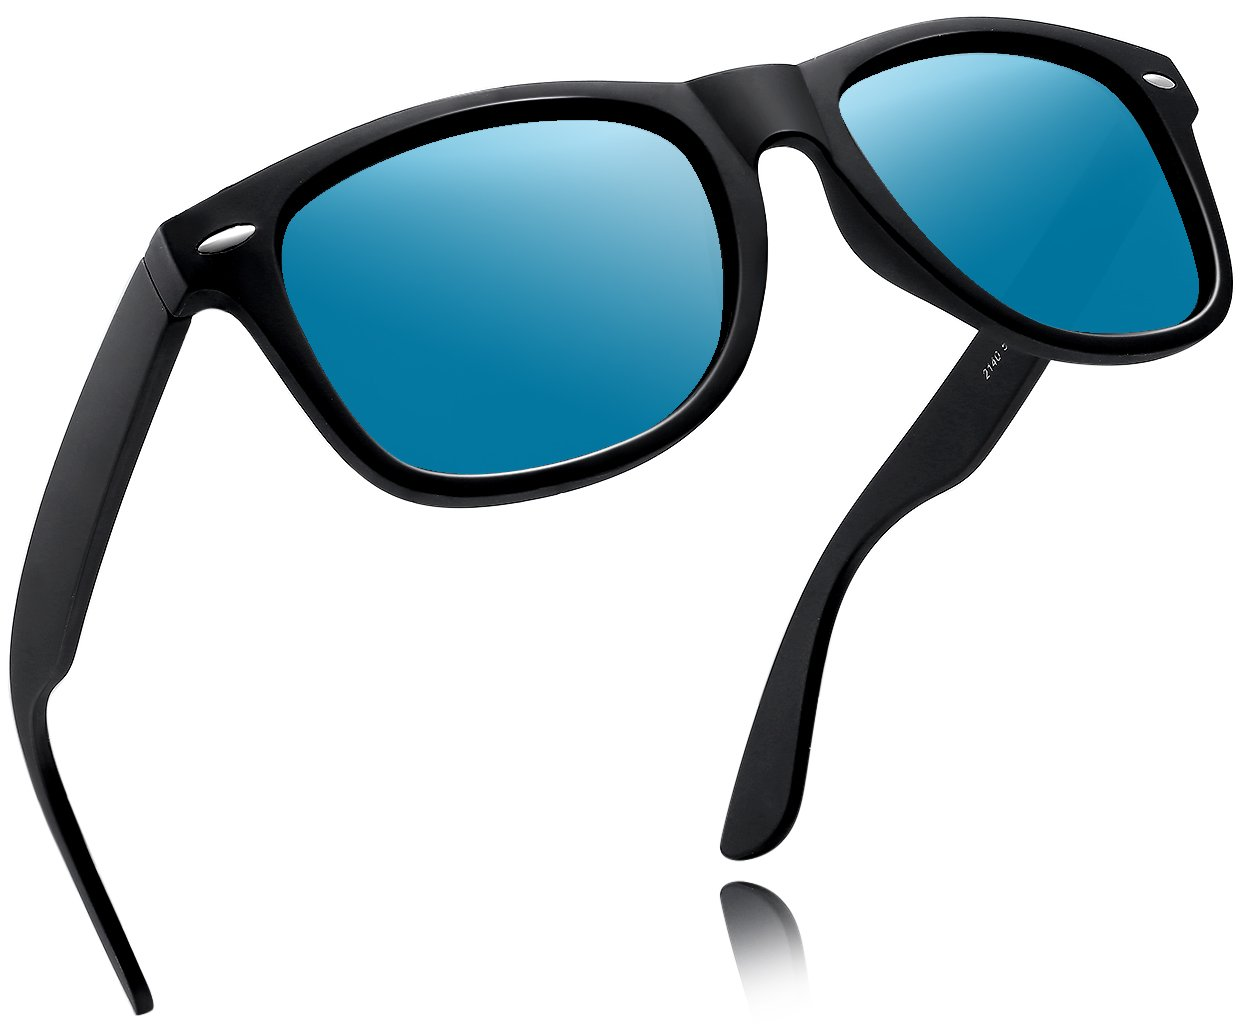 Joopin-2016 Retro Men Polarized Sunglasses Women Brand Sun Glasses Polaroid Lens With Box (Ice Blue)